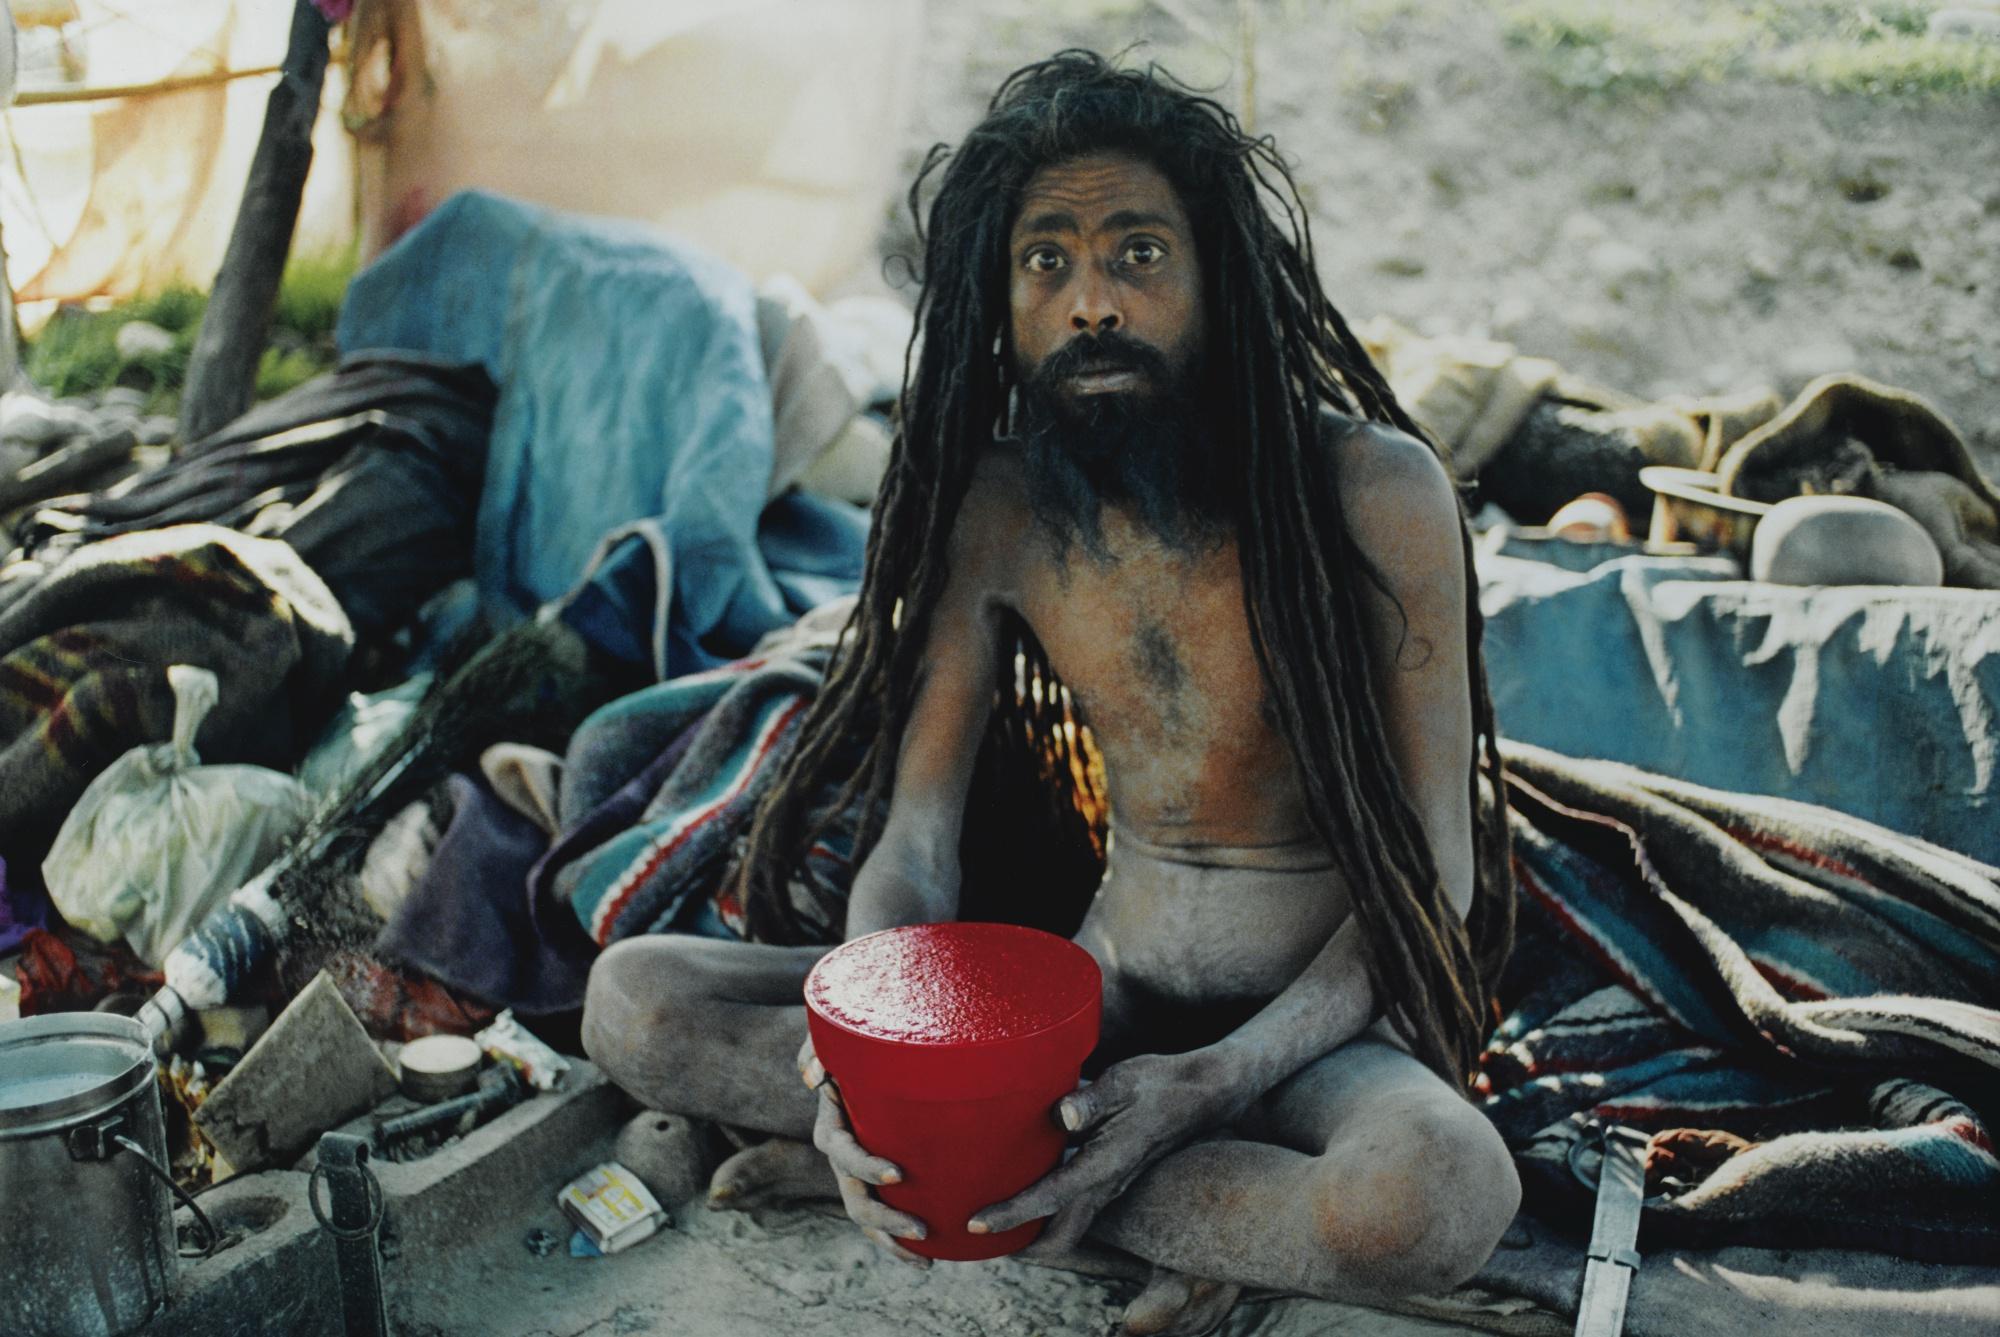 Philippe Chancel-Sadhu + Pot Khumba Mela 1998-2011